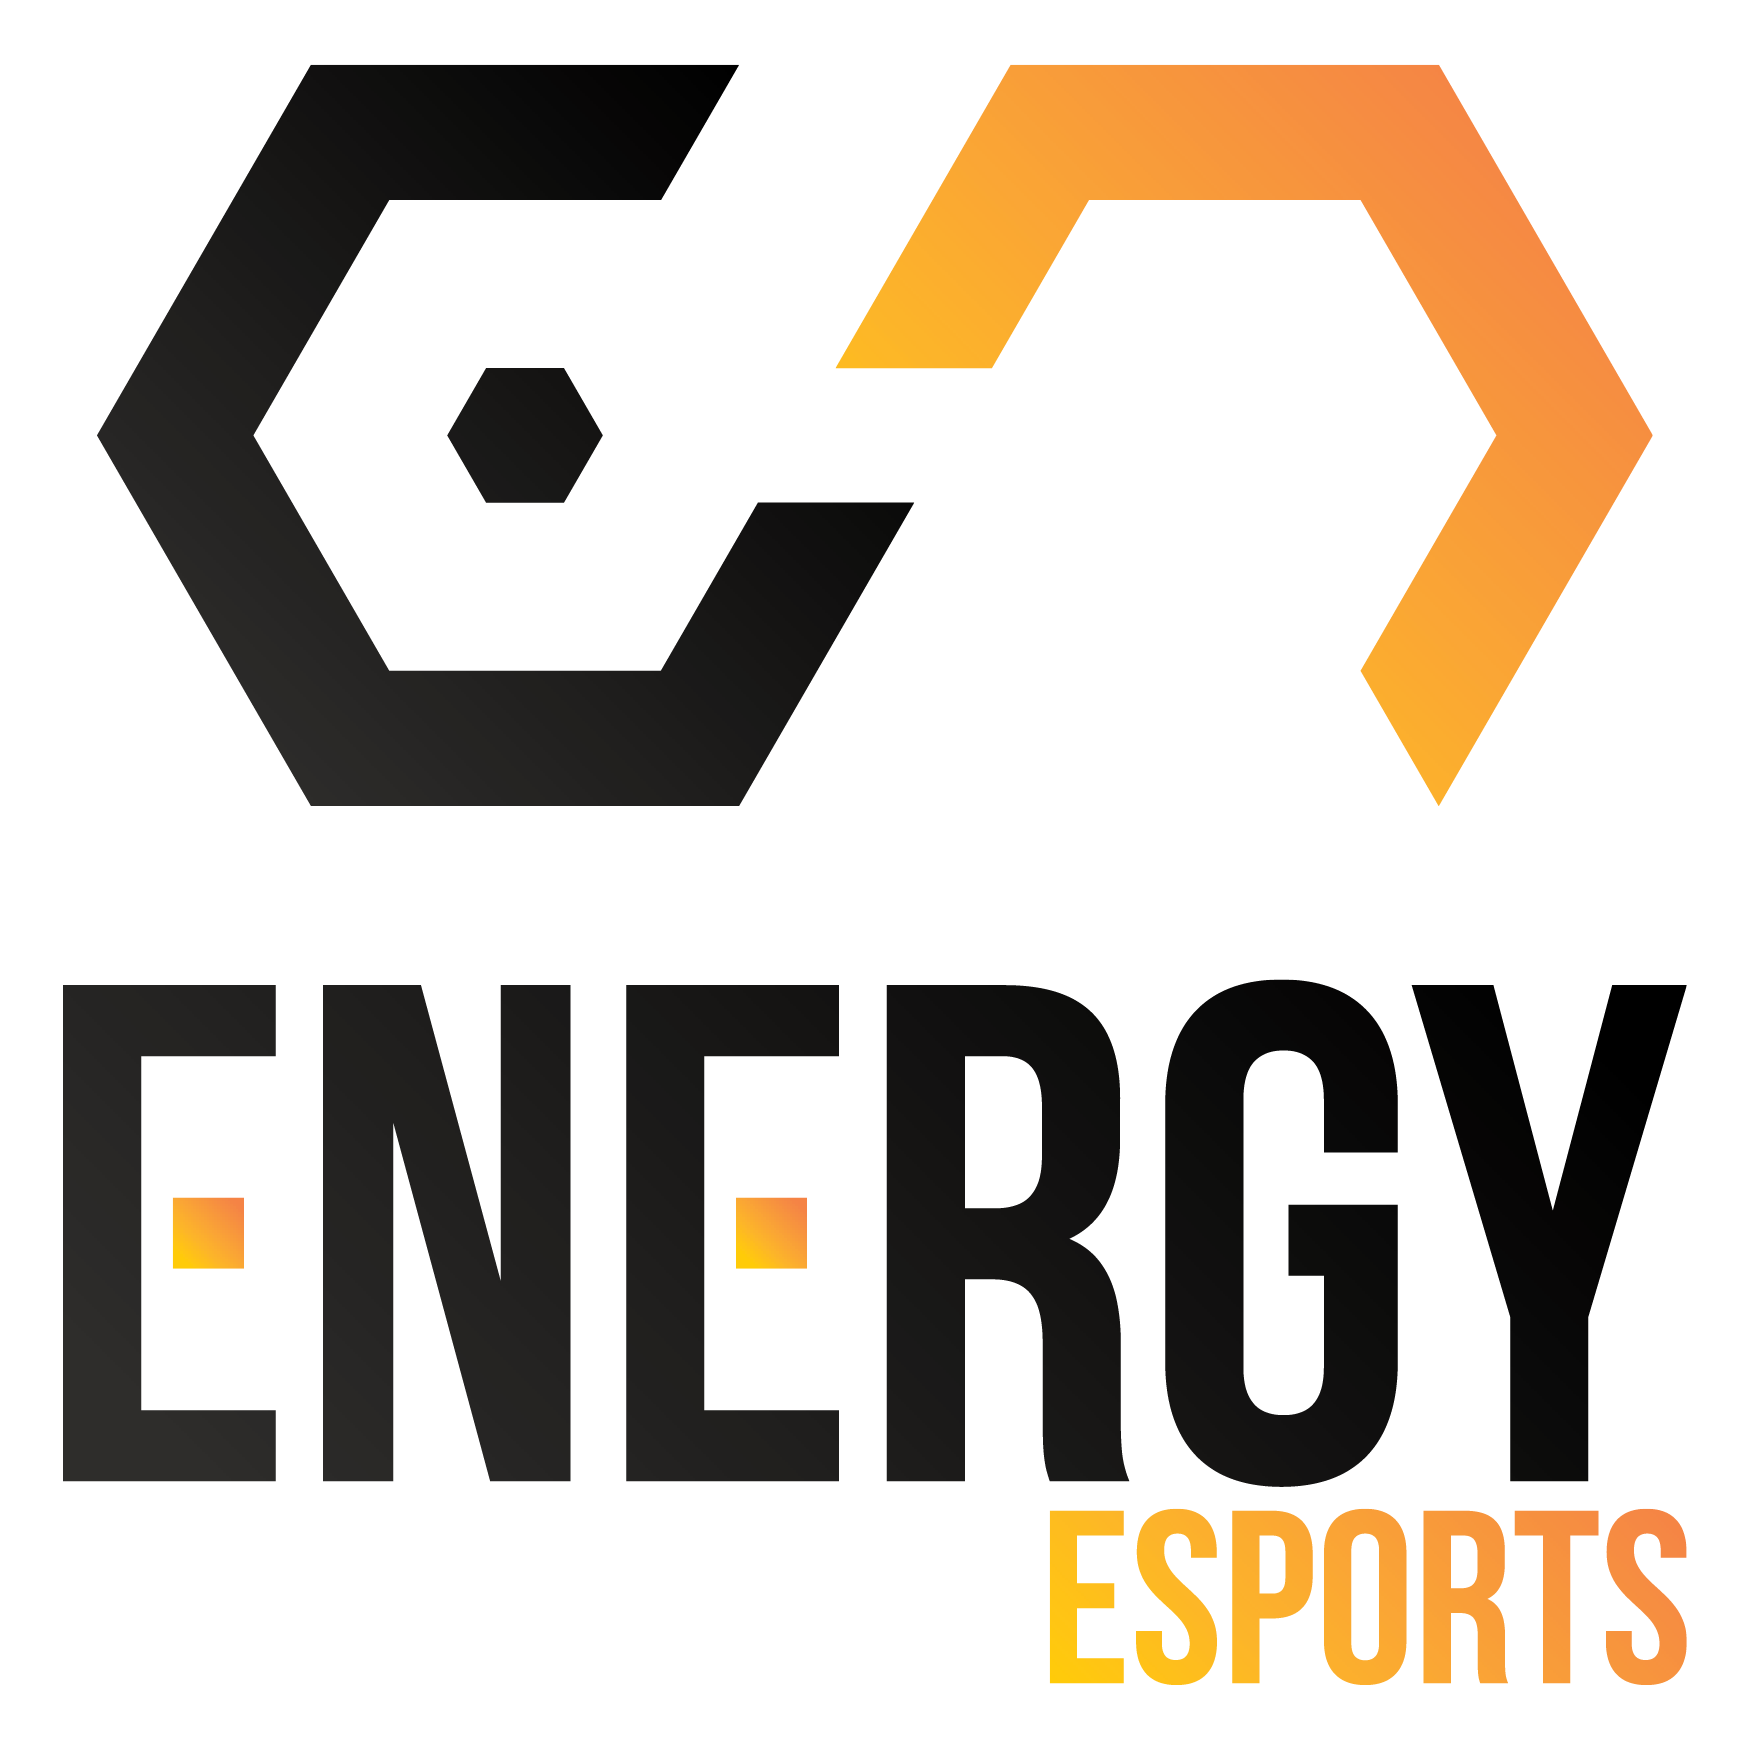 Energy Esports Dota 2 Team